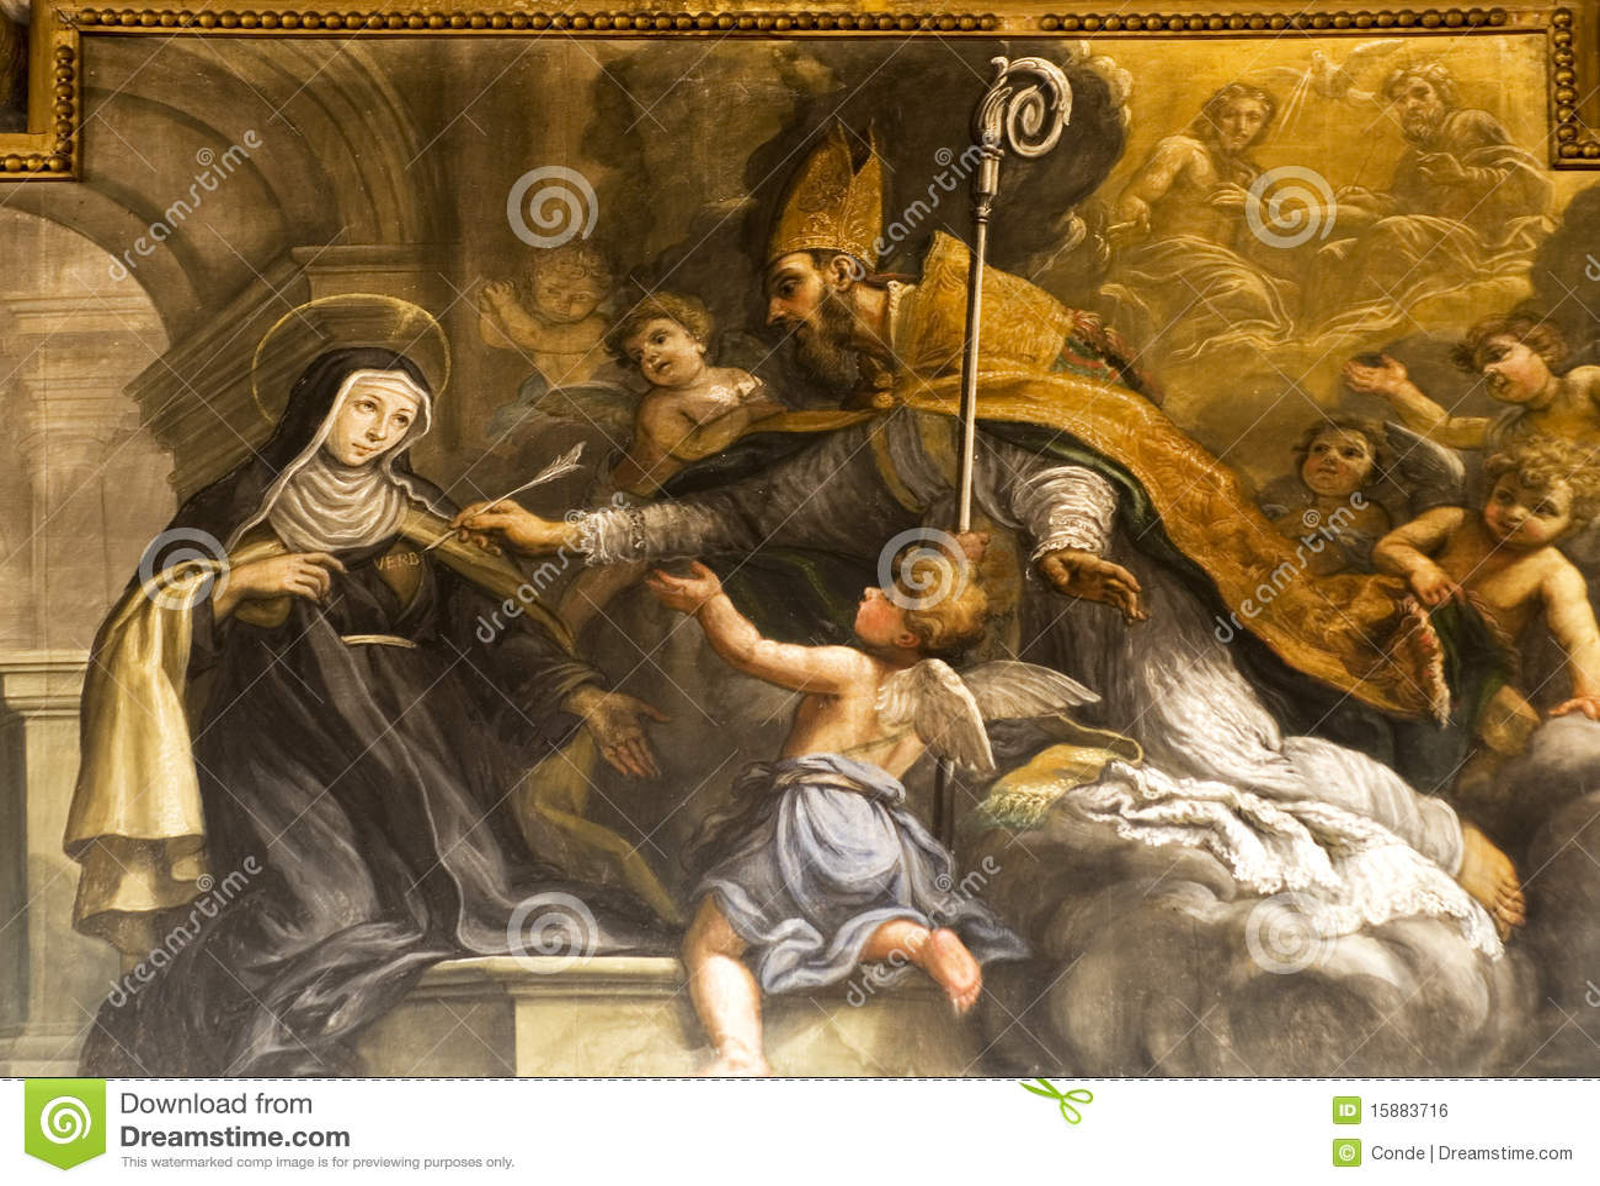 Peinture murale, groupe